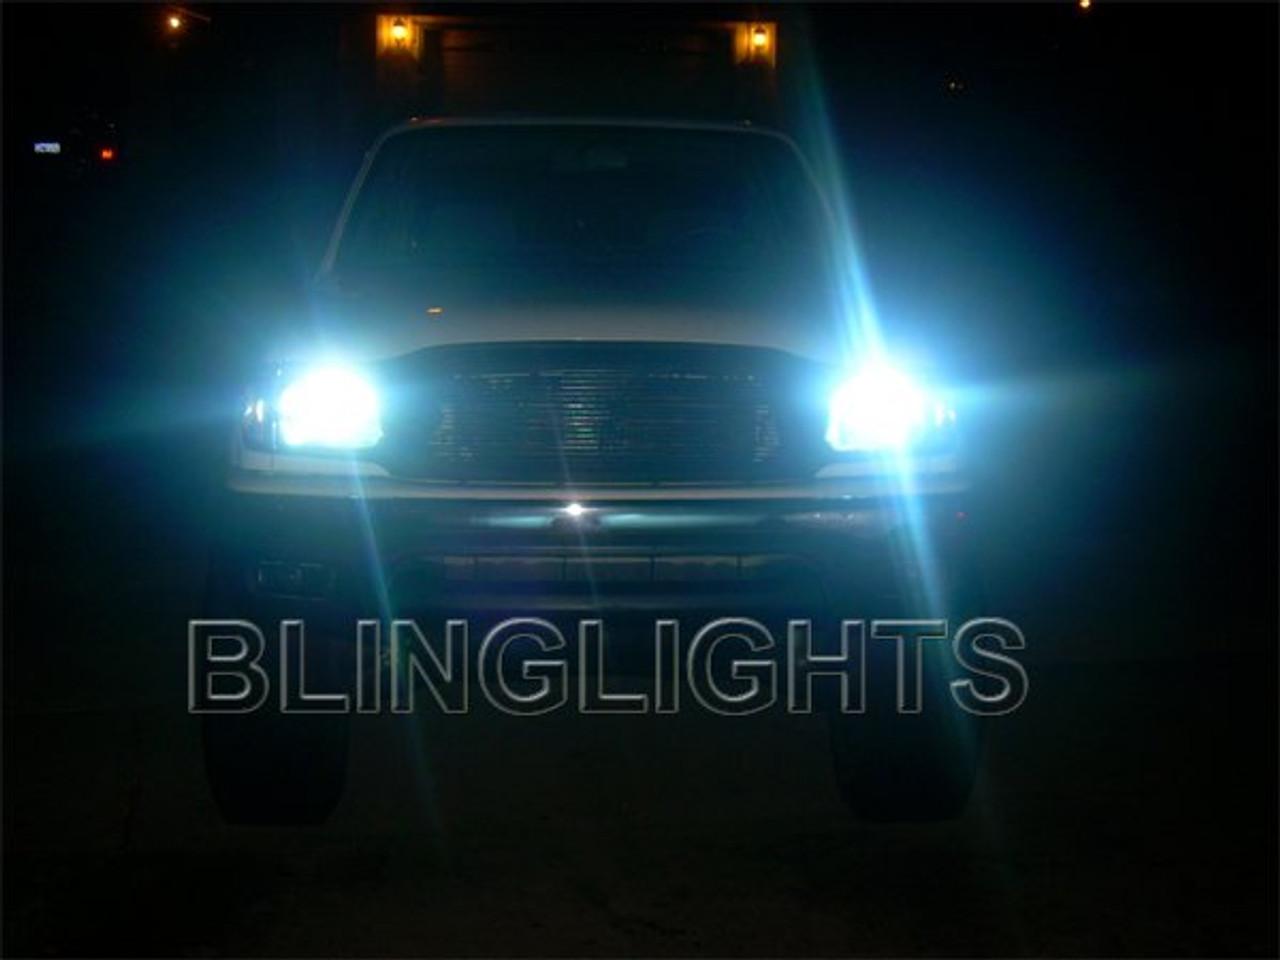 2001 2002 2003 2004 Toyota Tacoma Xenon HID Conversion Kit for Headlamps Headlights Head Lamp Lights